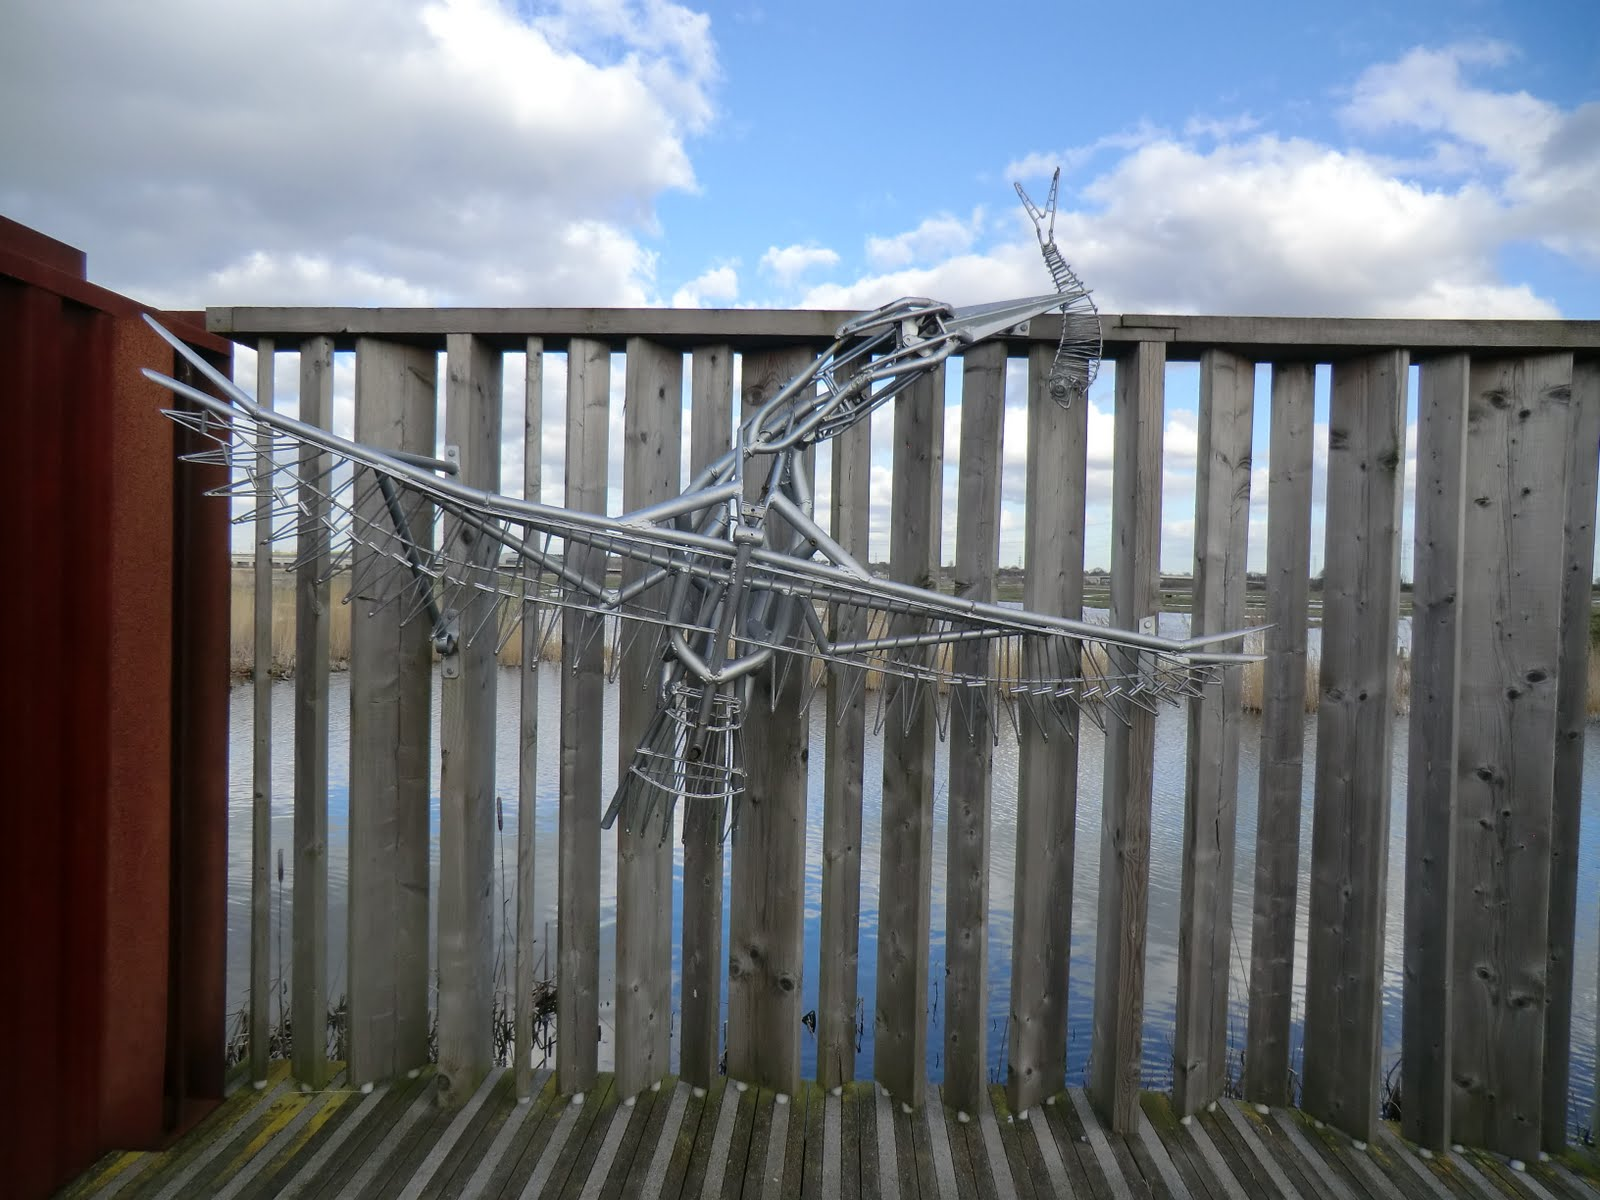 CIMG9960 Heron sculpture